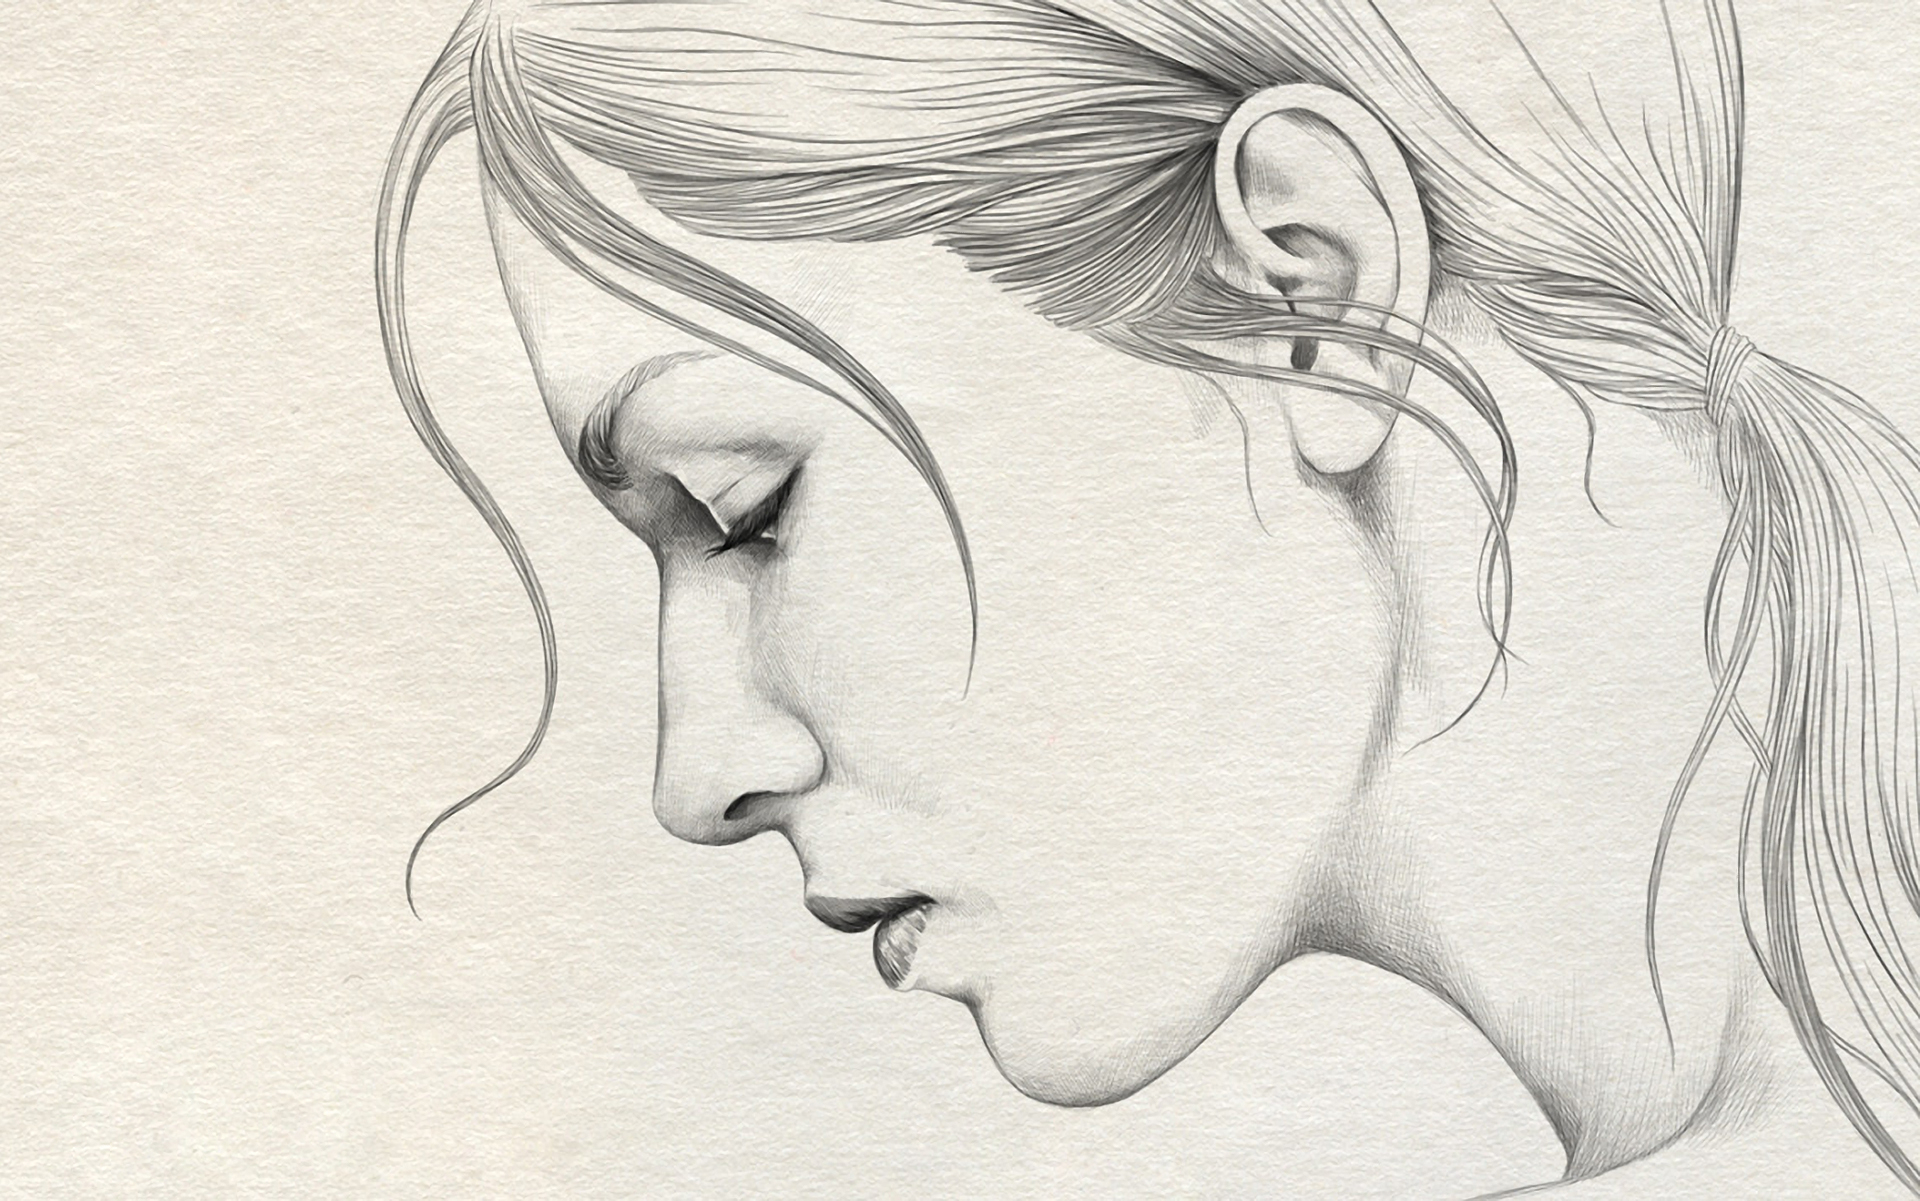 1920x1201 Pencil Sketches Girls Faces Pencil Sketch Face Girls Pencil Sketch